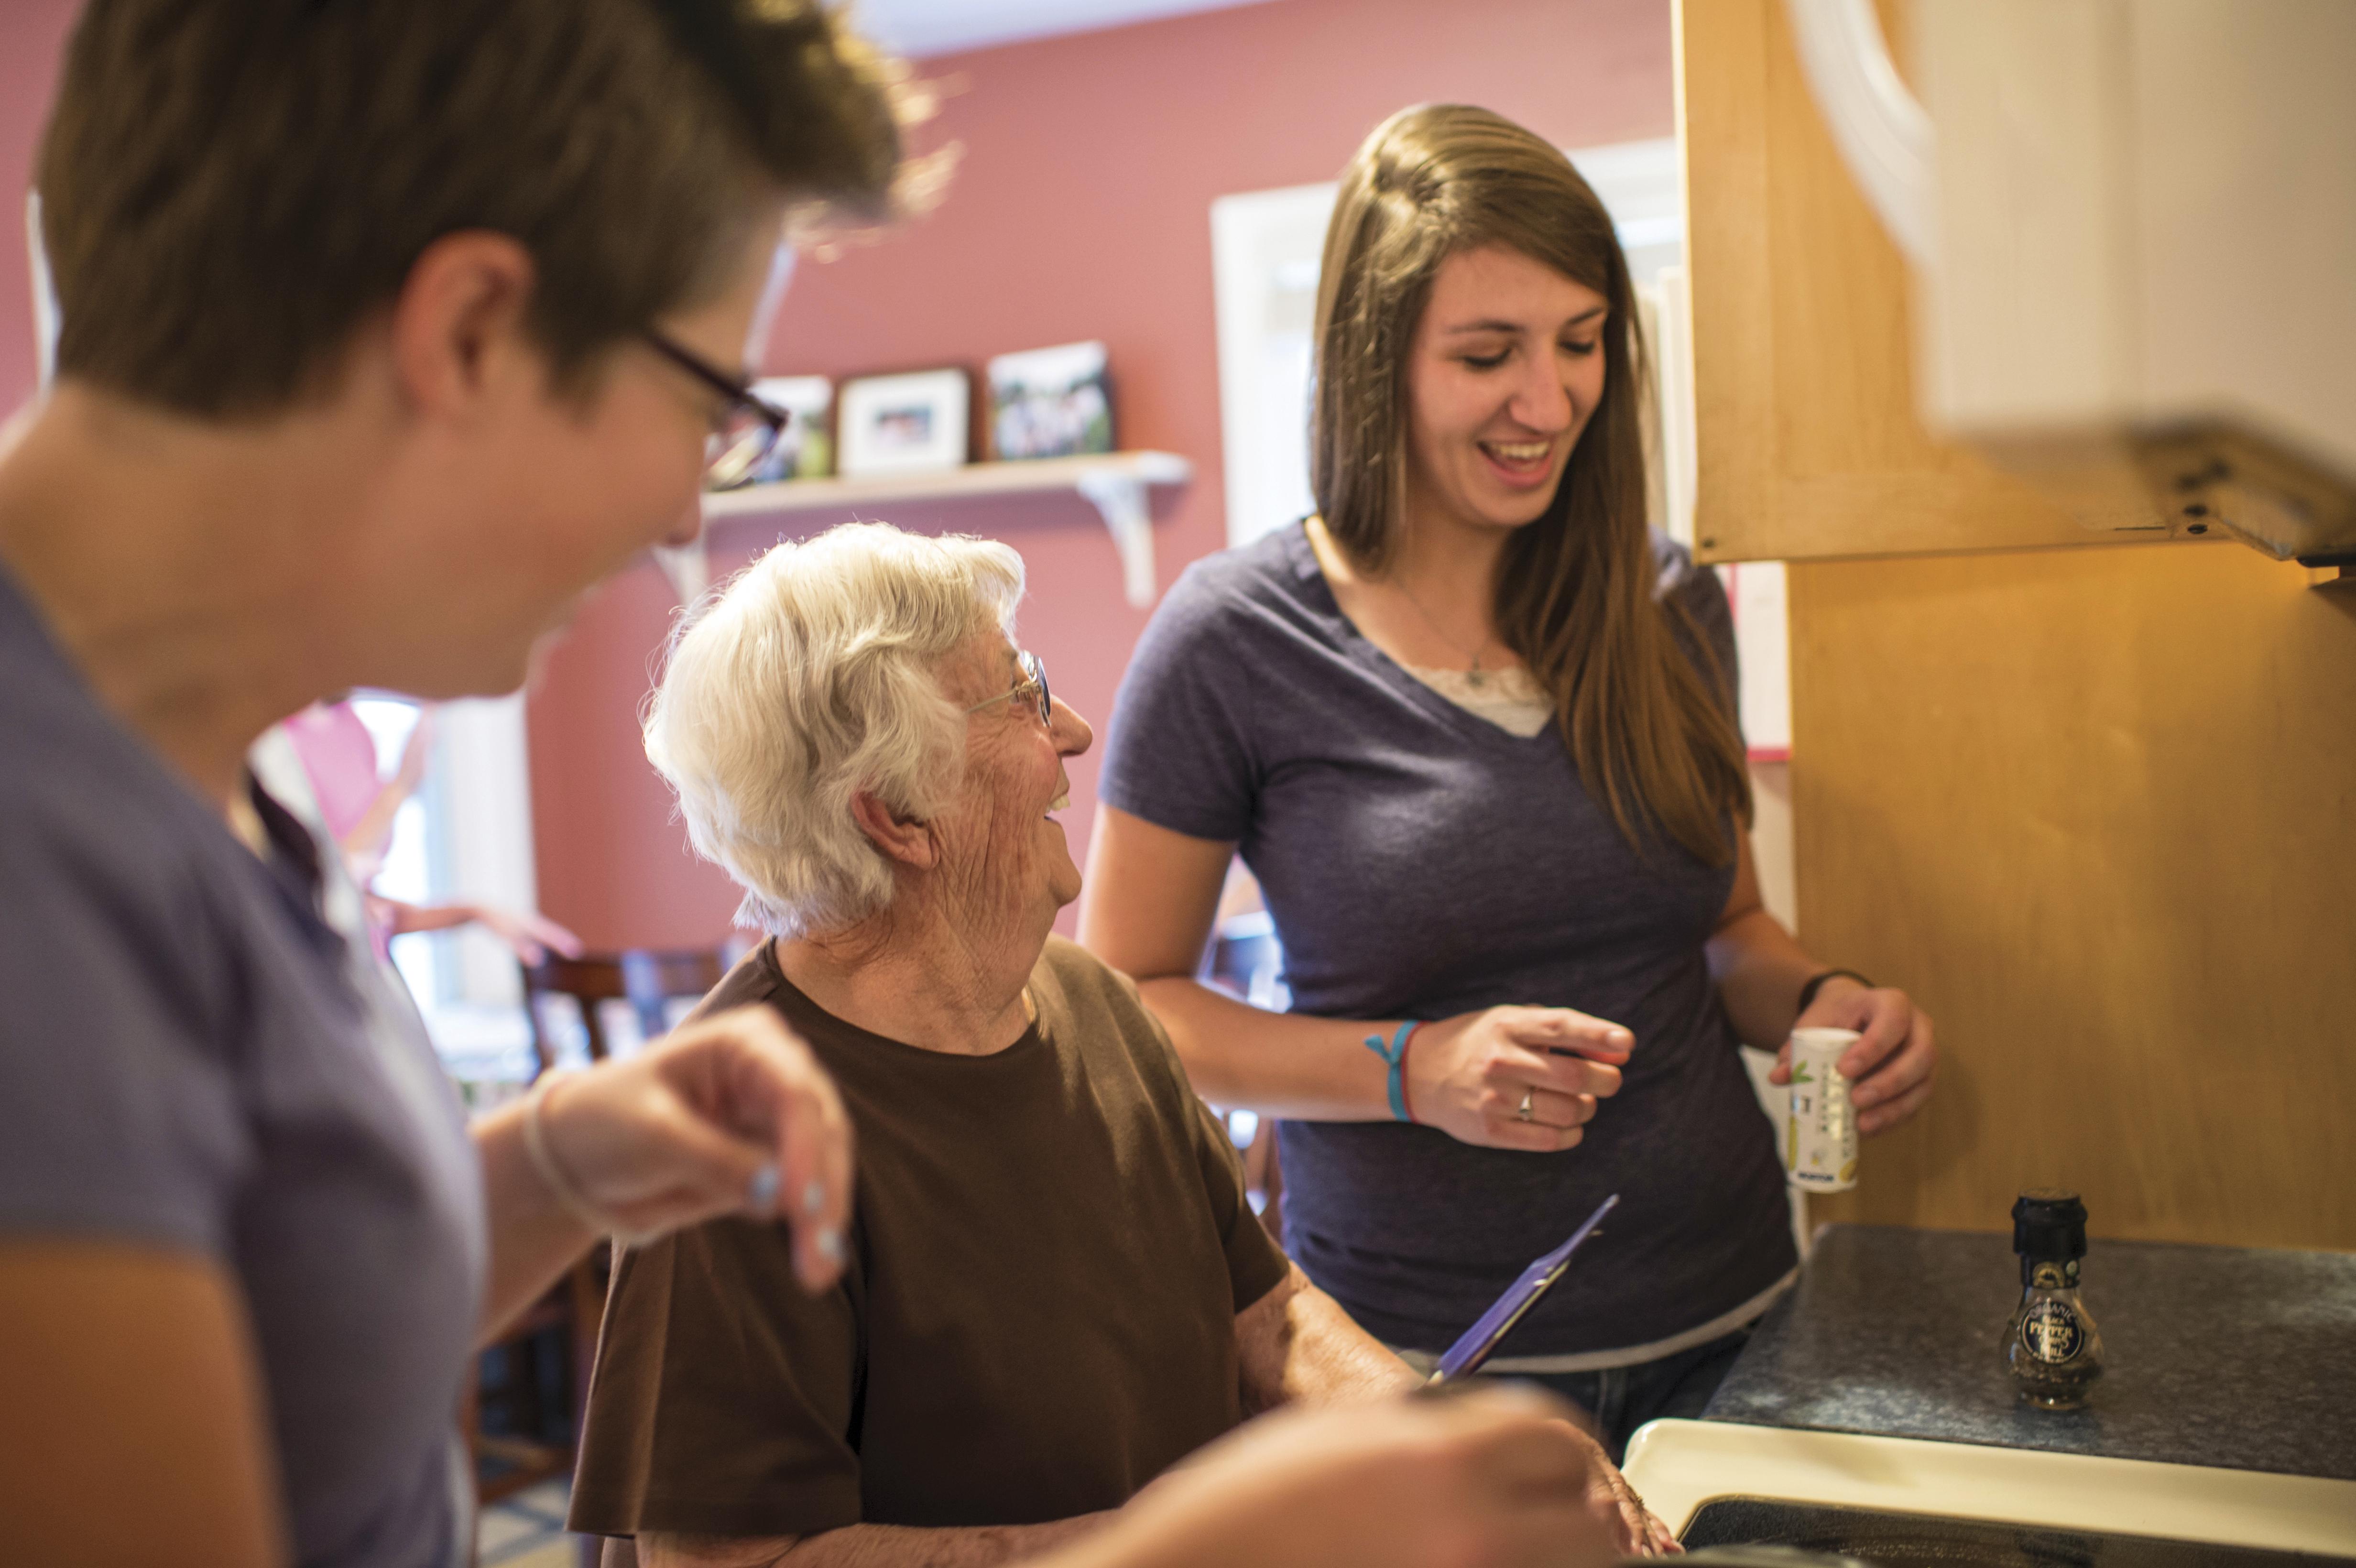 Young women helping an elderly woman.